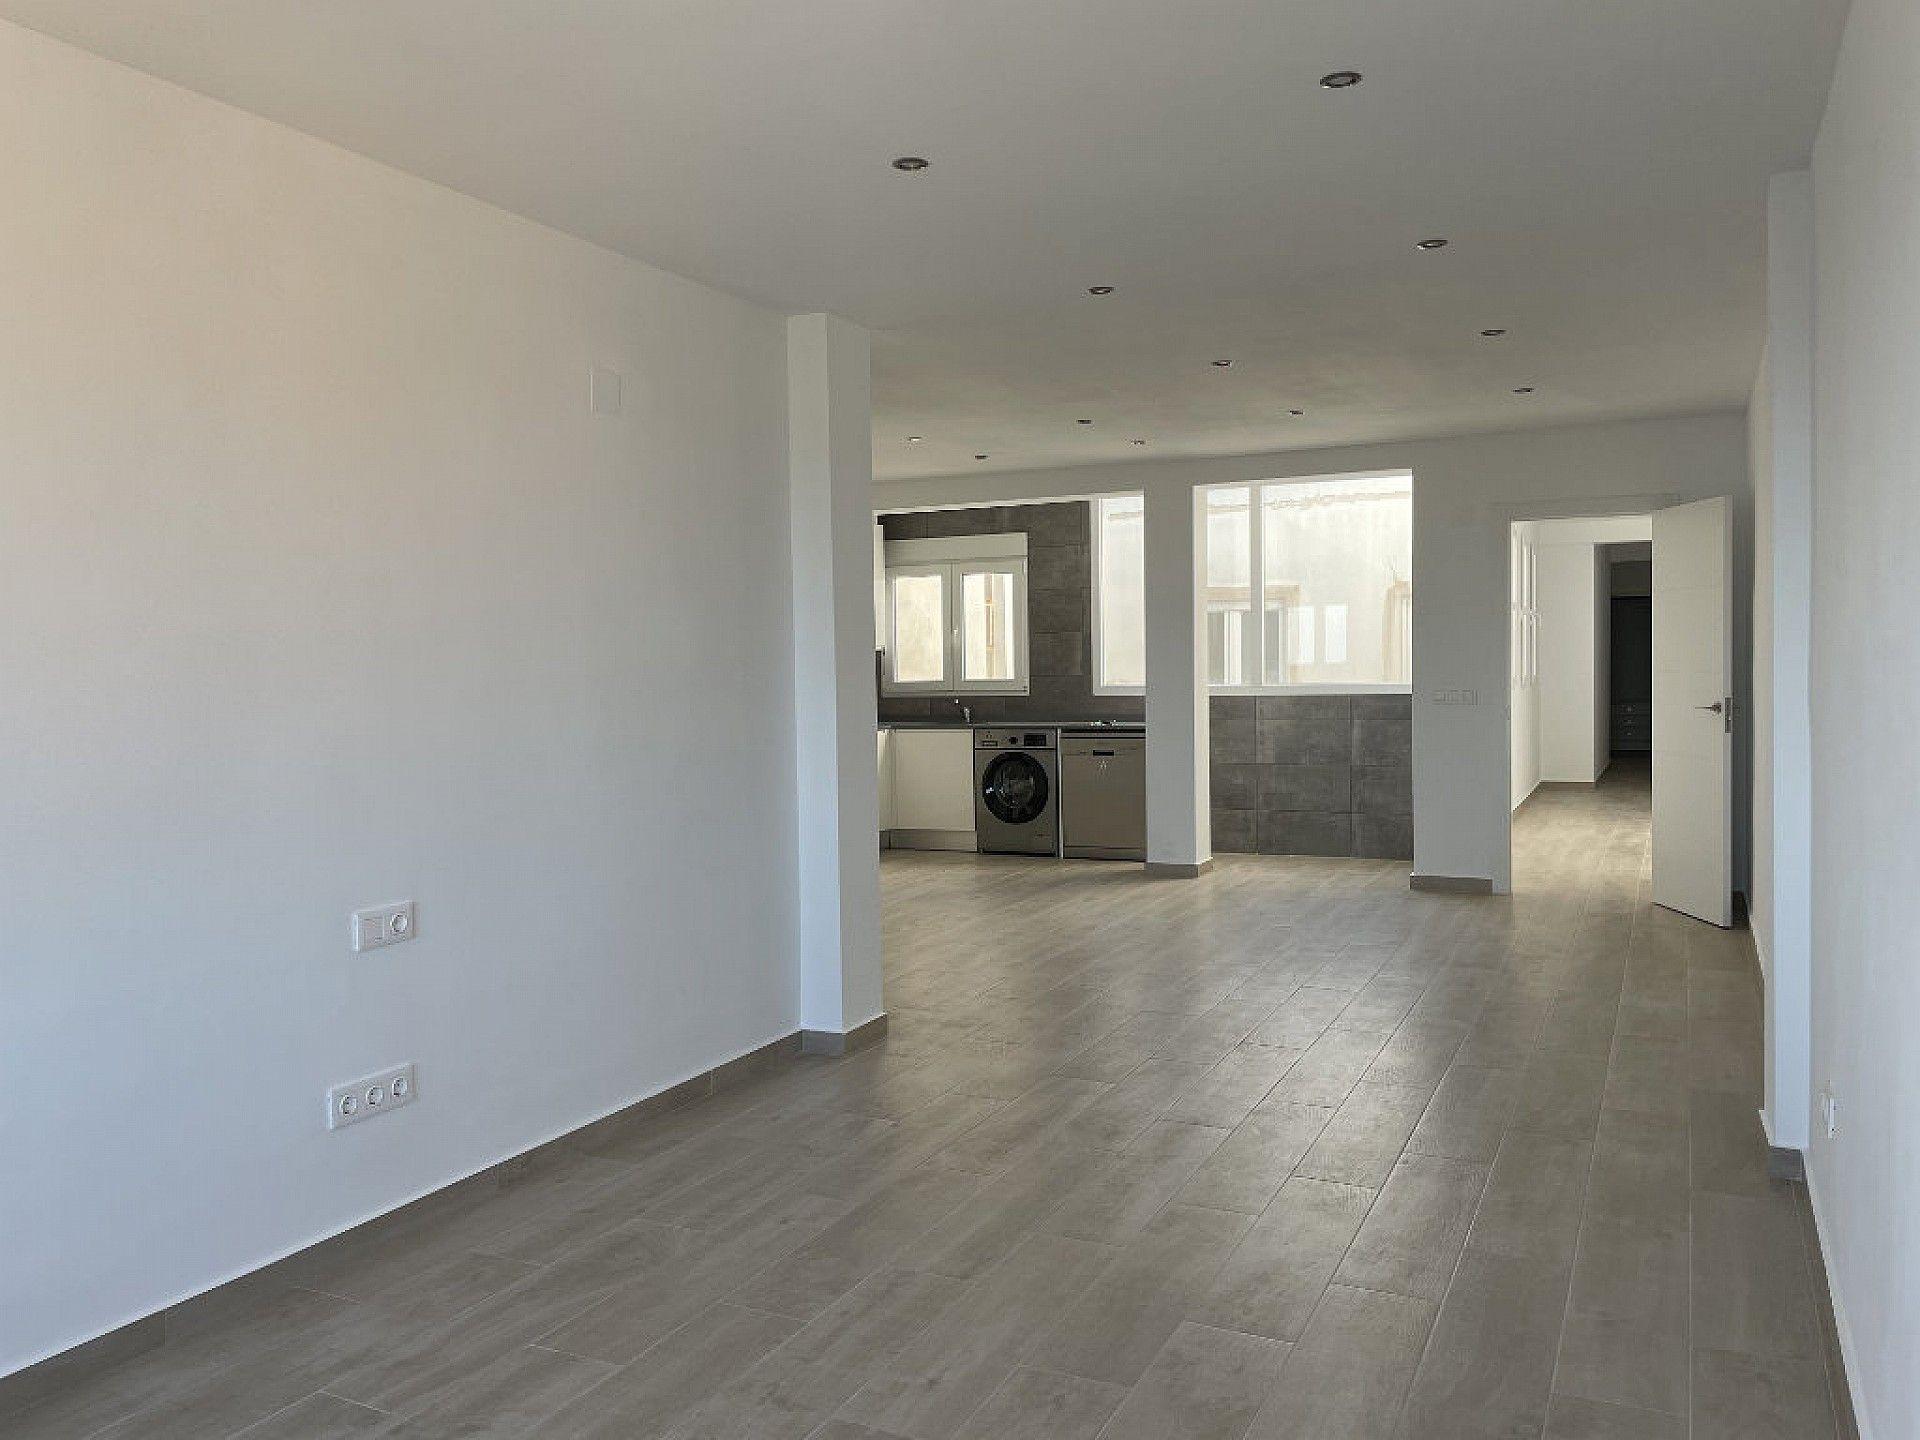 w_appartement-te-koop-costa-blanca-benissa-spanje-a1018-011-2.jpg